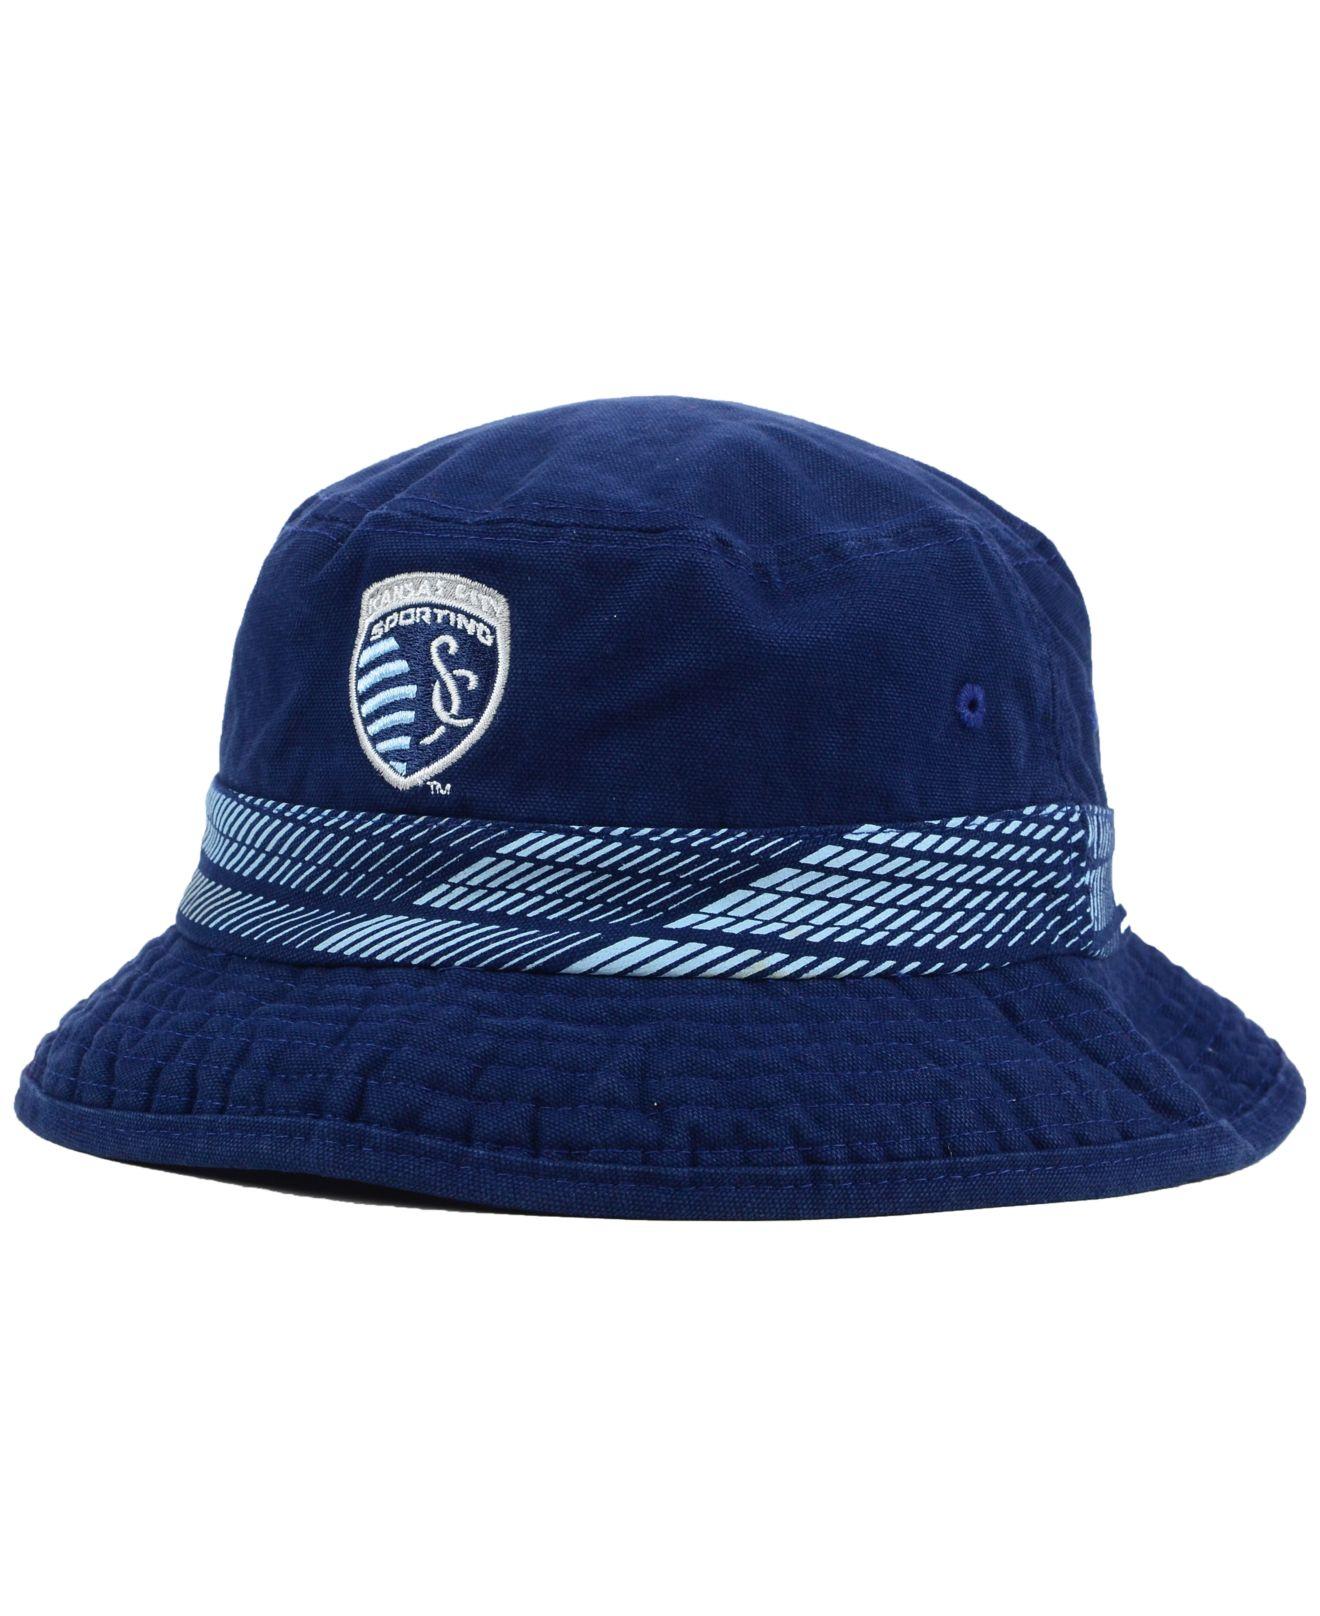 3f41efd3a09 Lyst - adidas Sporting Kansas City Evolution Bucket Hat in Blue for Men